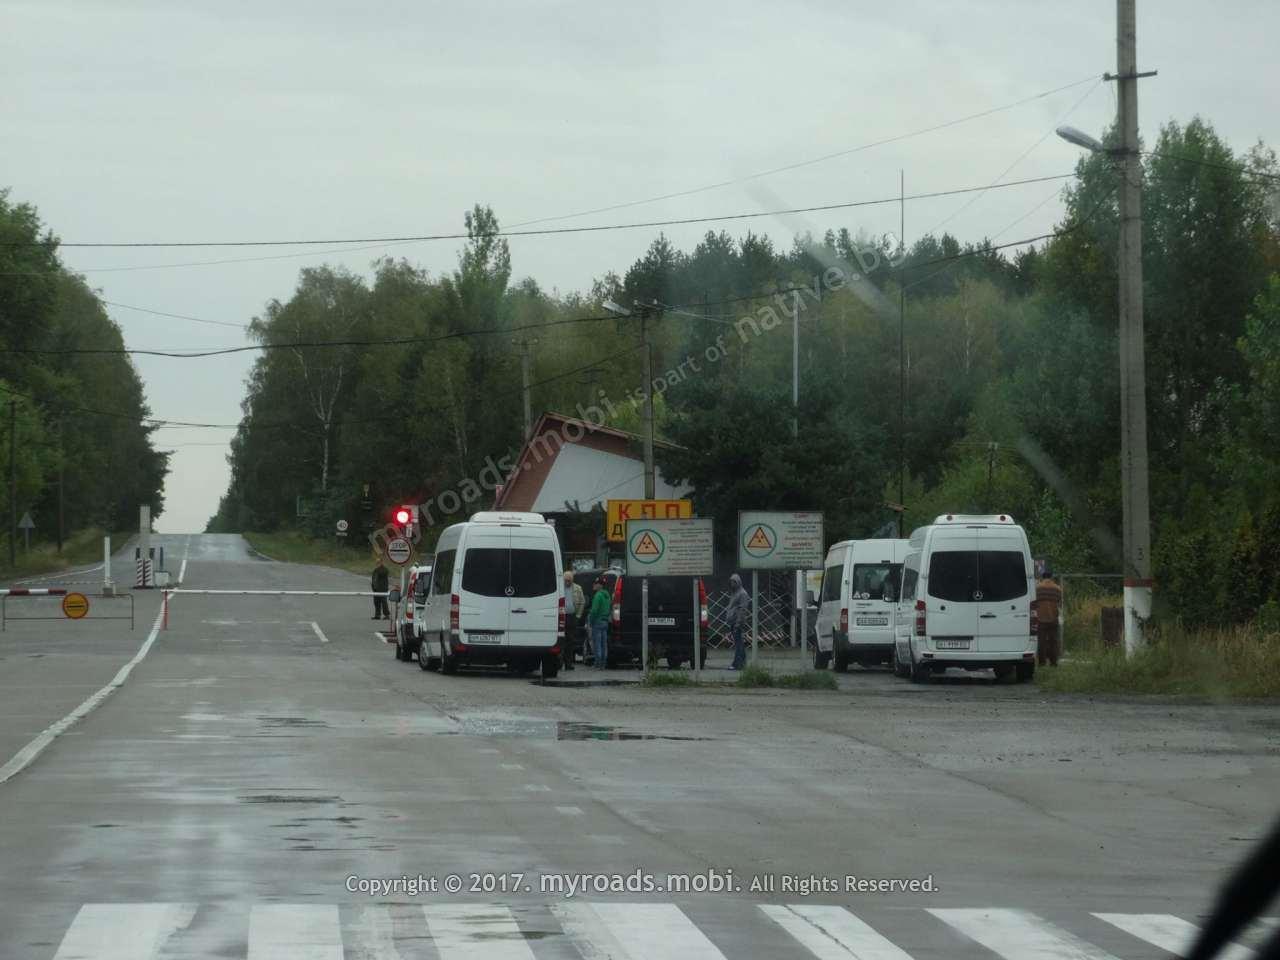 chernobil-pripyat-myroadsmobi-georgi-ivanov (31)